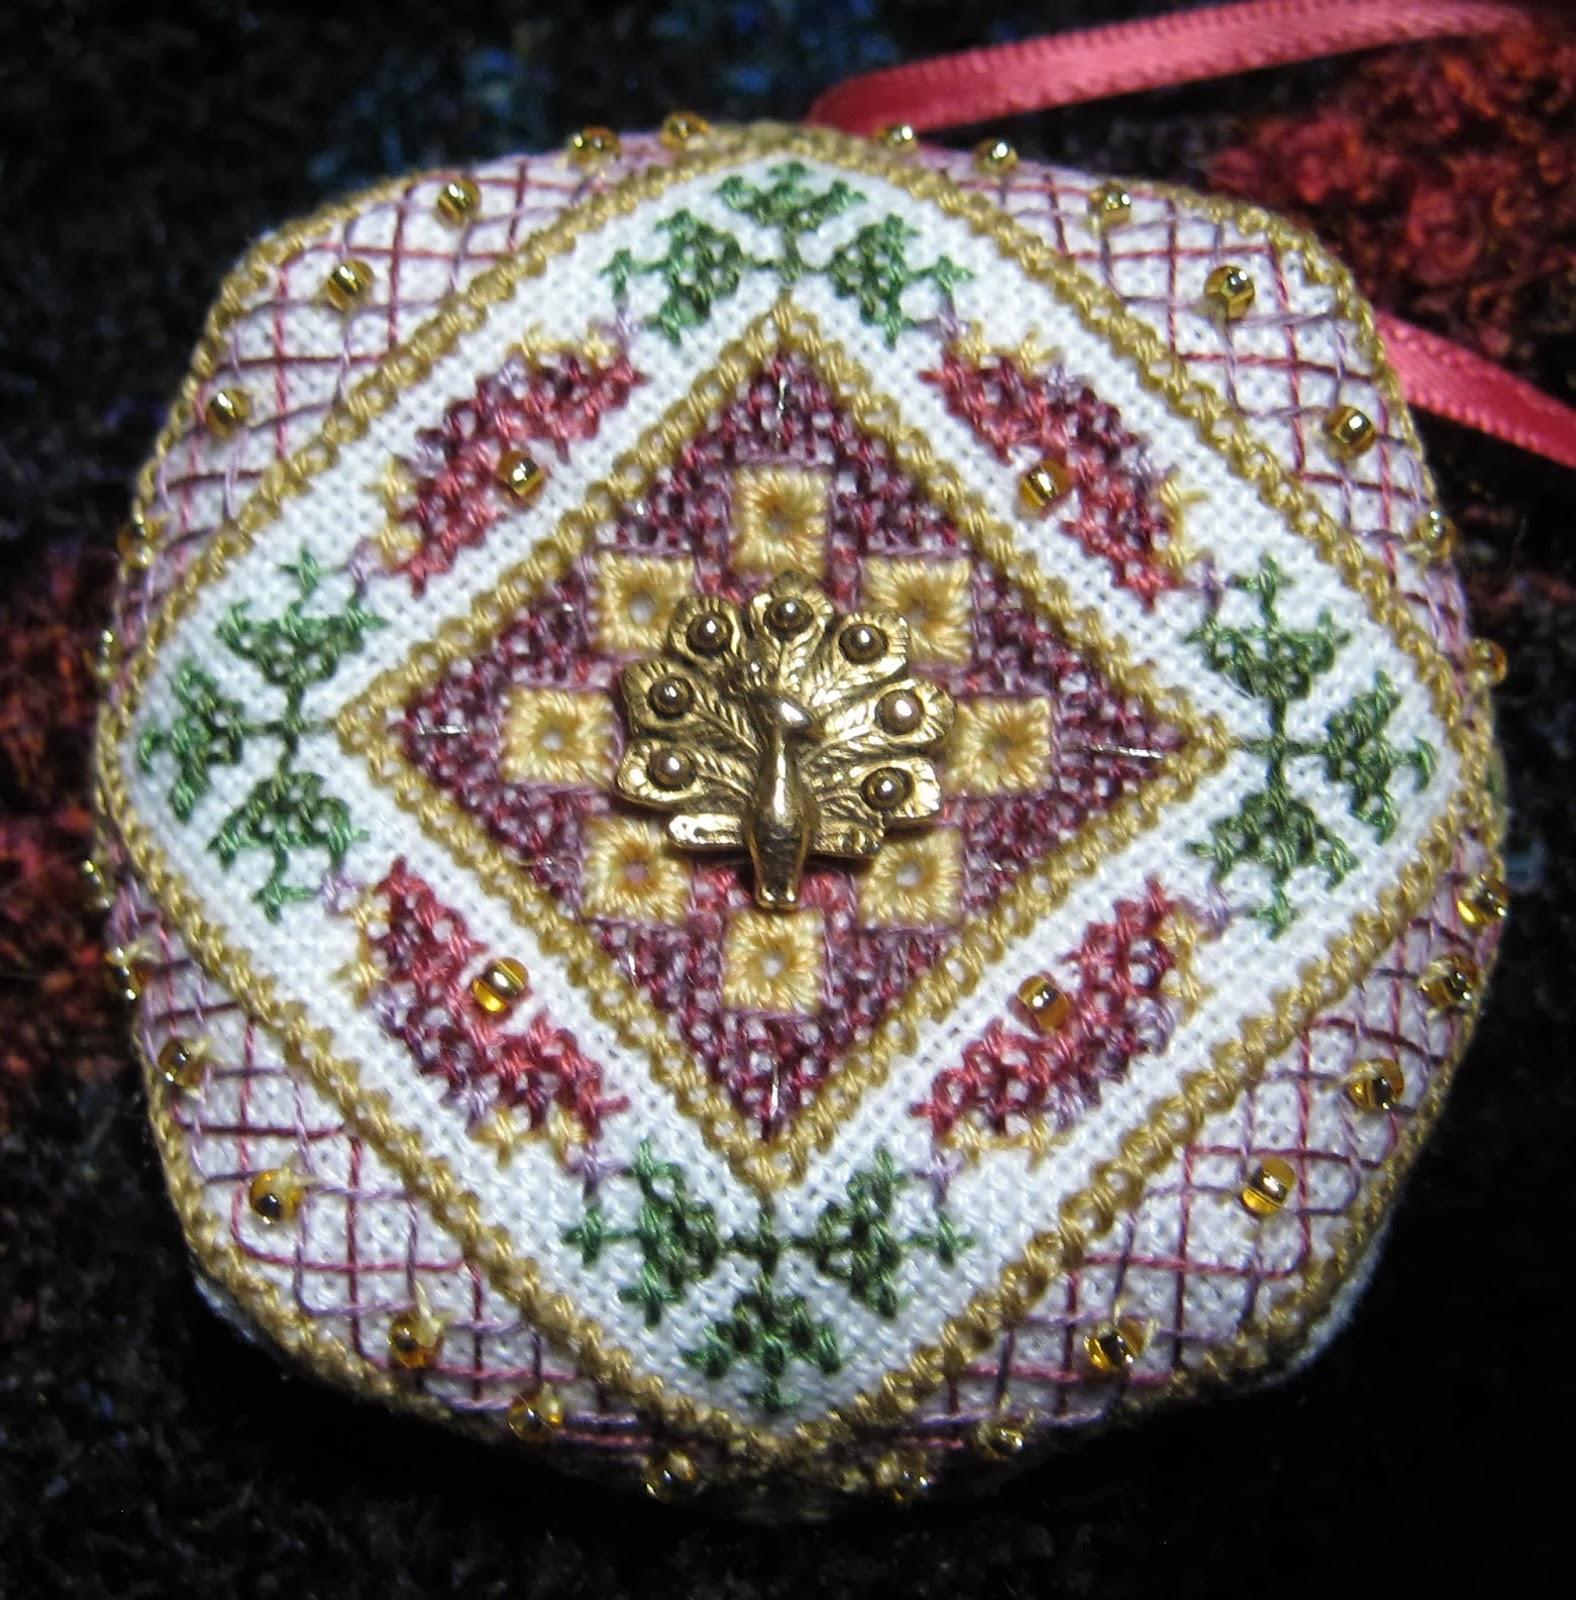 http://4.bp.blogspot.com/-zS9SkSTnUeI/UusW_TZINUI/AAAAAAAABcQ/pzVJVmcx0EI/s1600/TW-Peacock+Tapestry+Orn.+Biscornu.JPG